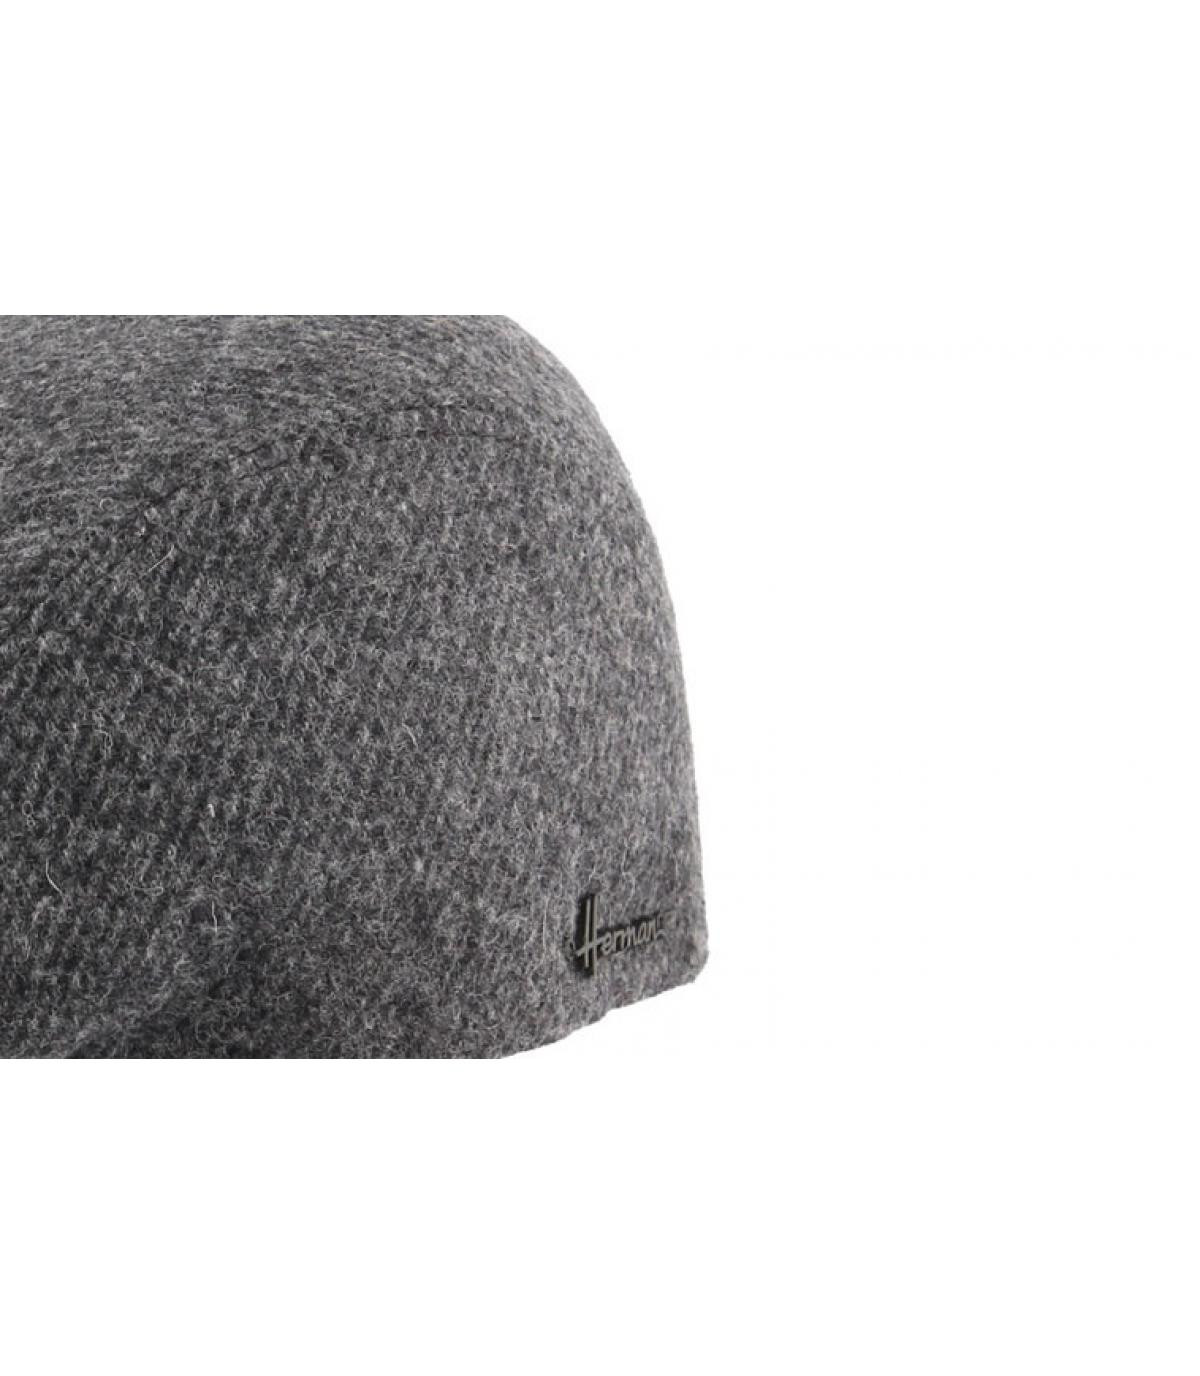 Dettagli Range wool EF grey - image 3